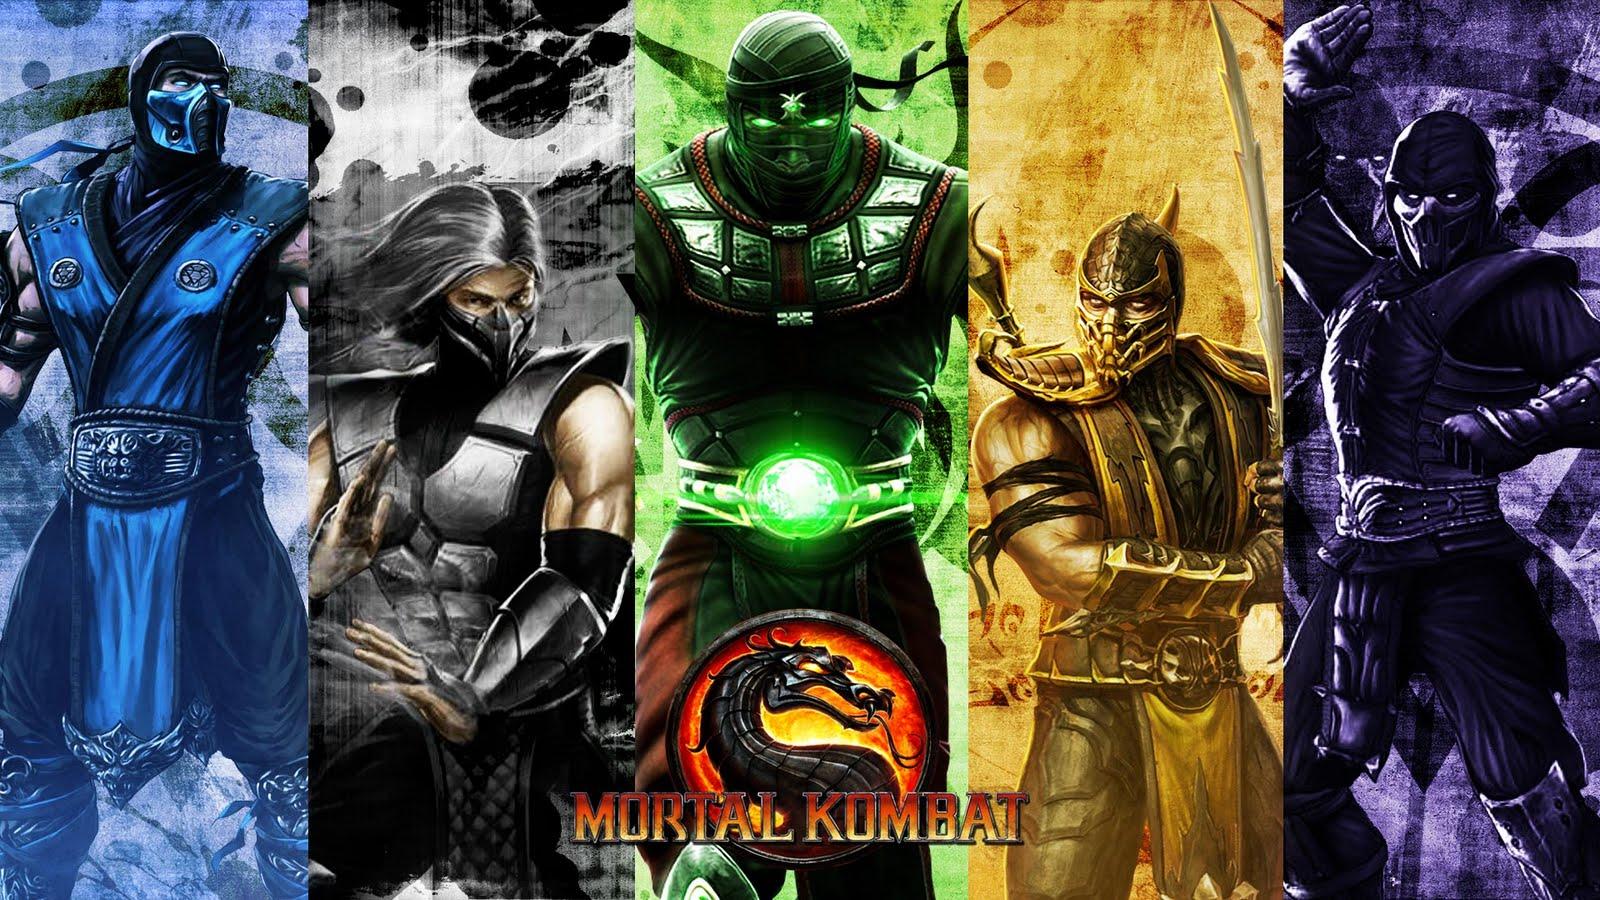 MORTAL KOMBAT BRASIL Mortal Kombat 9 Wallpapers 1600x900